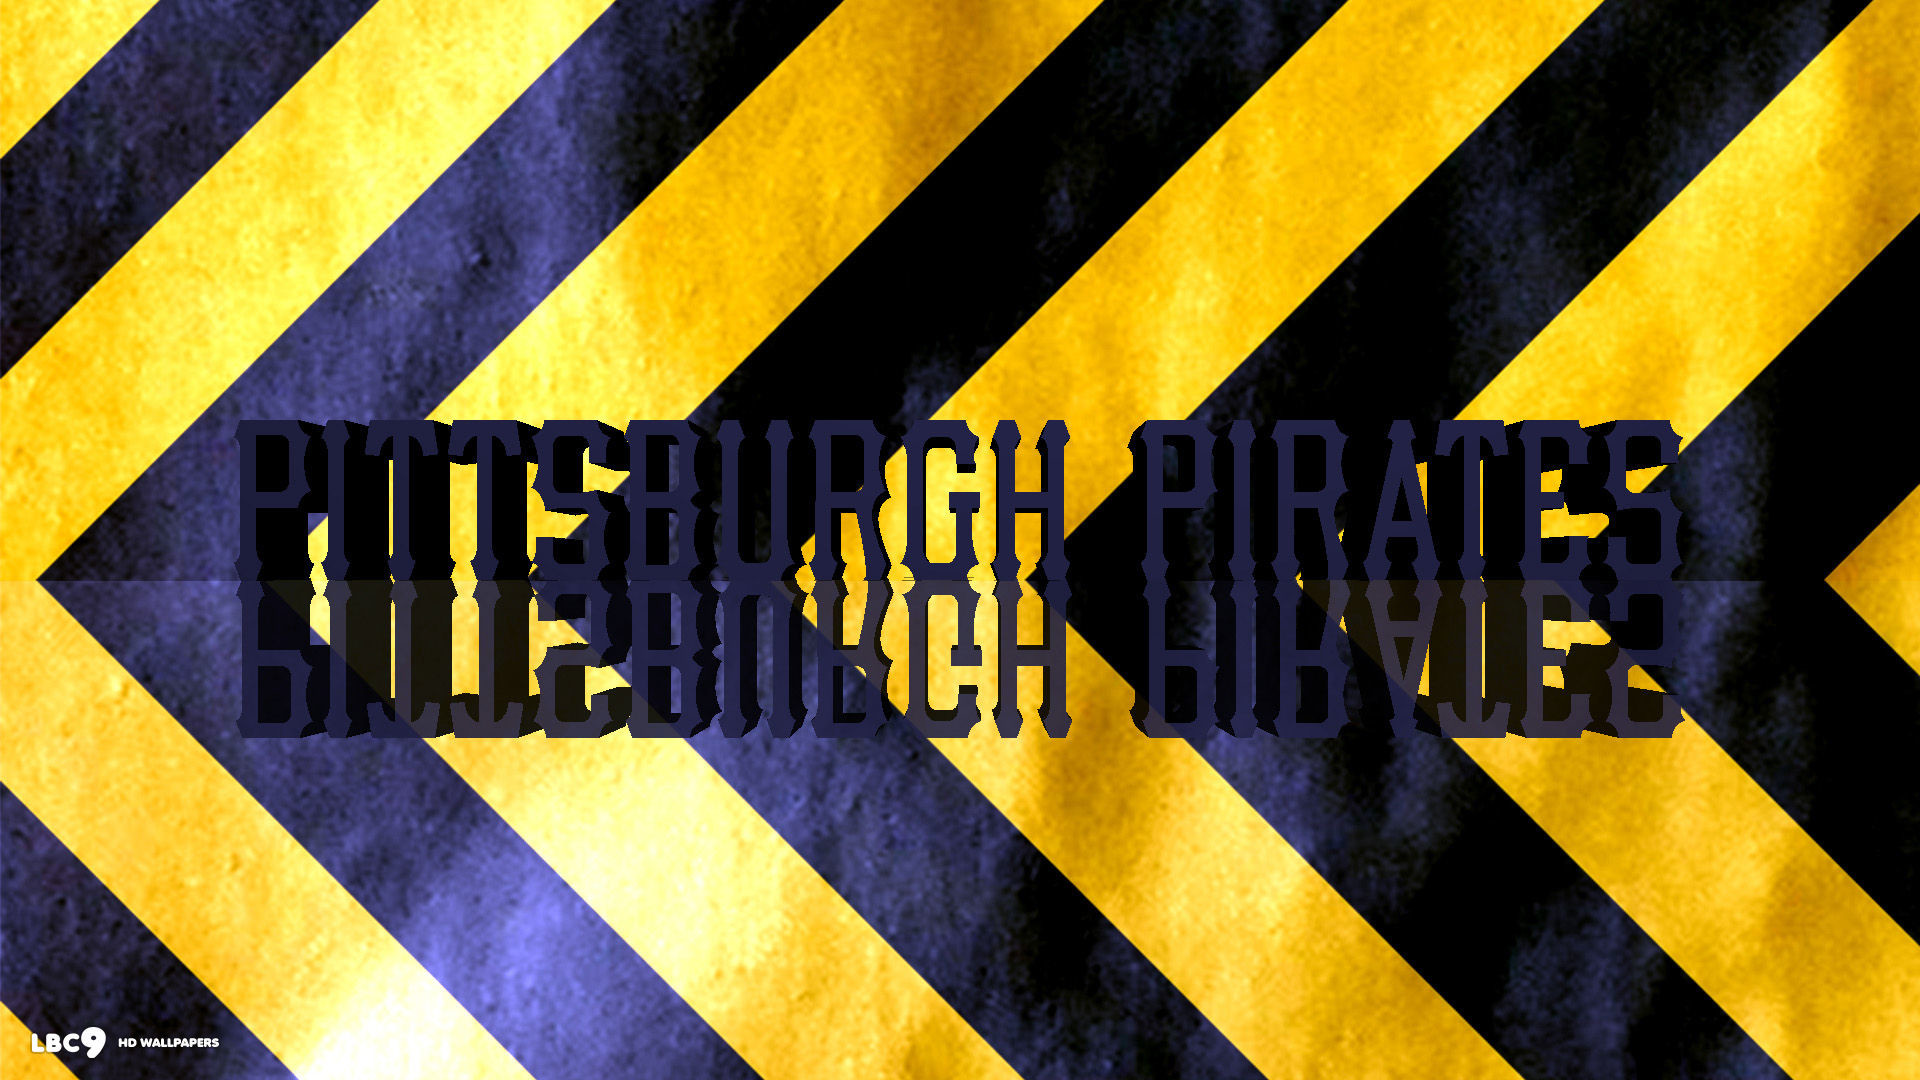 pittsburgh pirates stripes wallpaper